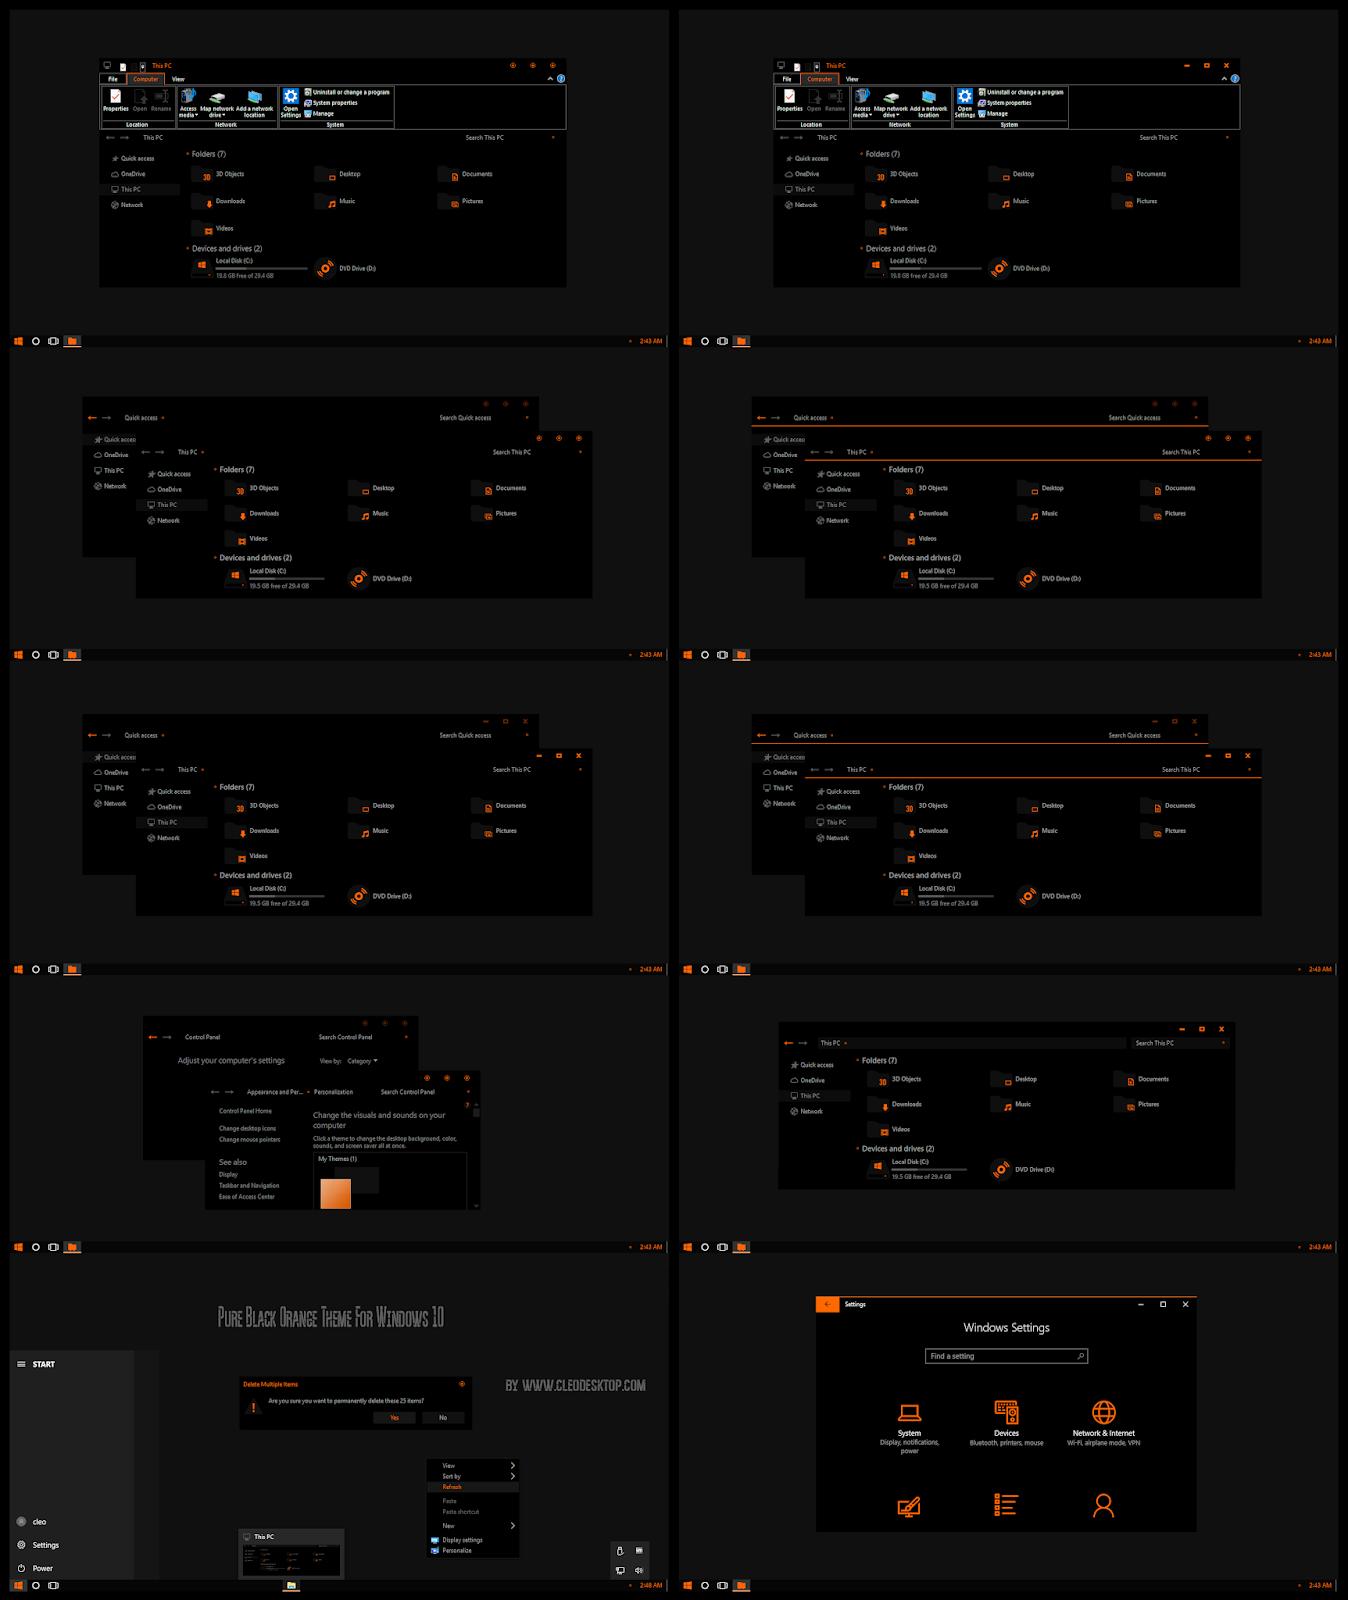 Pure Black Orange Theme For Windows10 2004